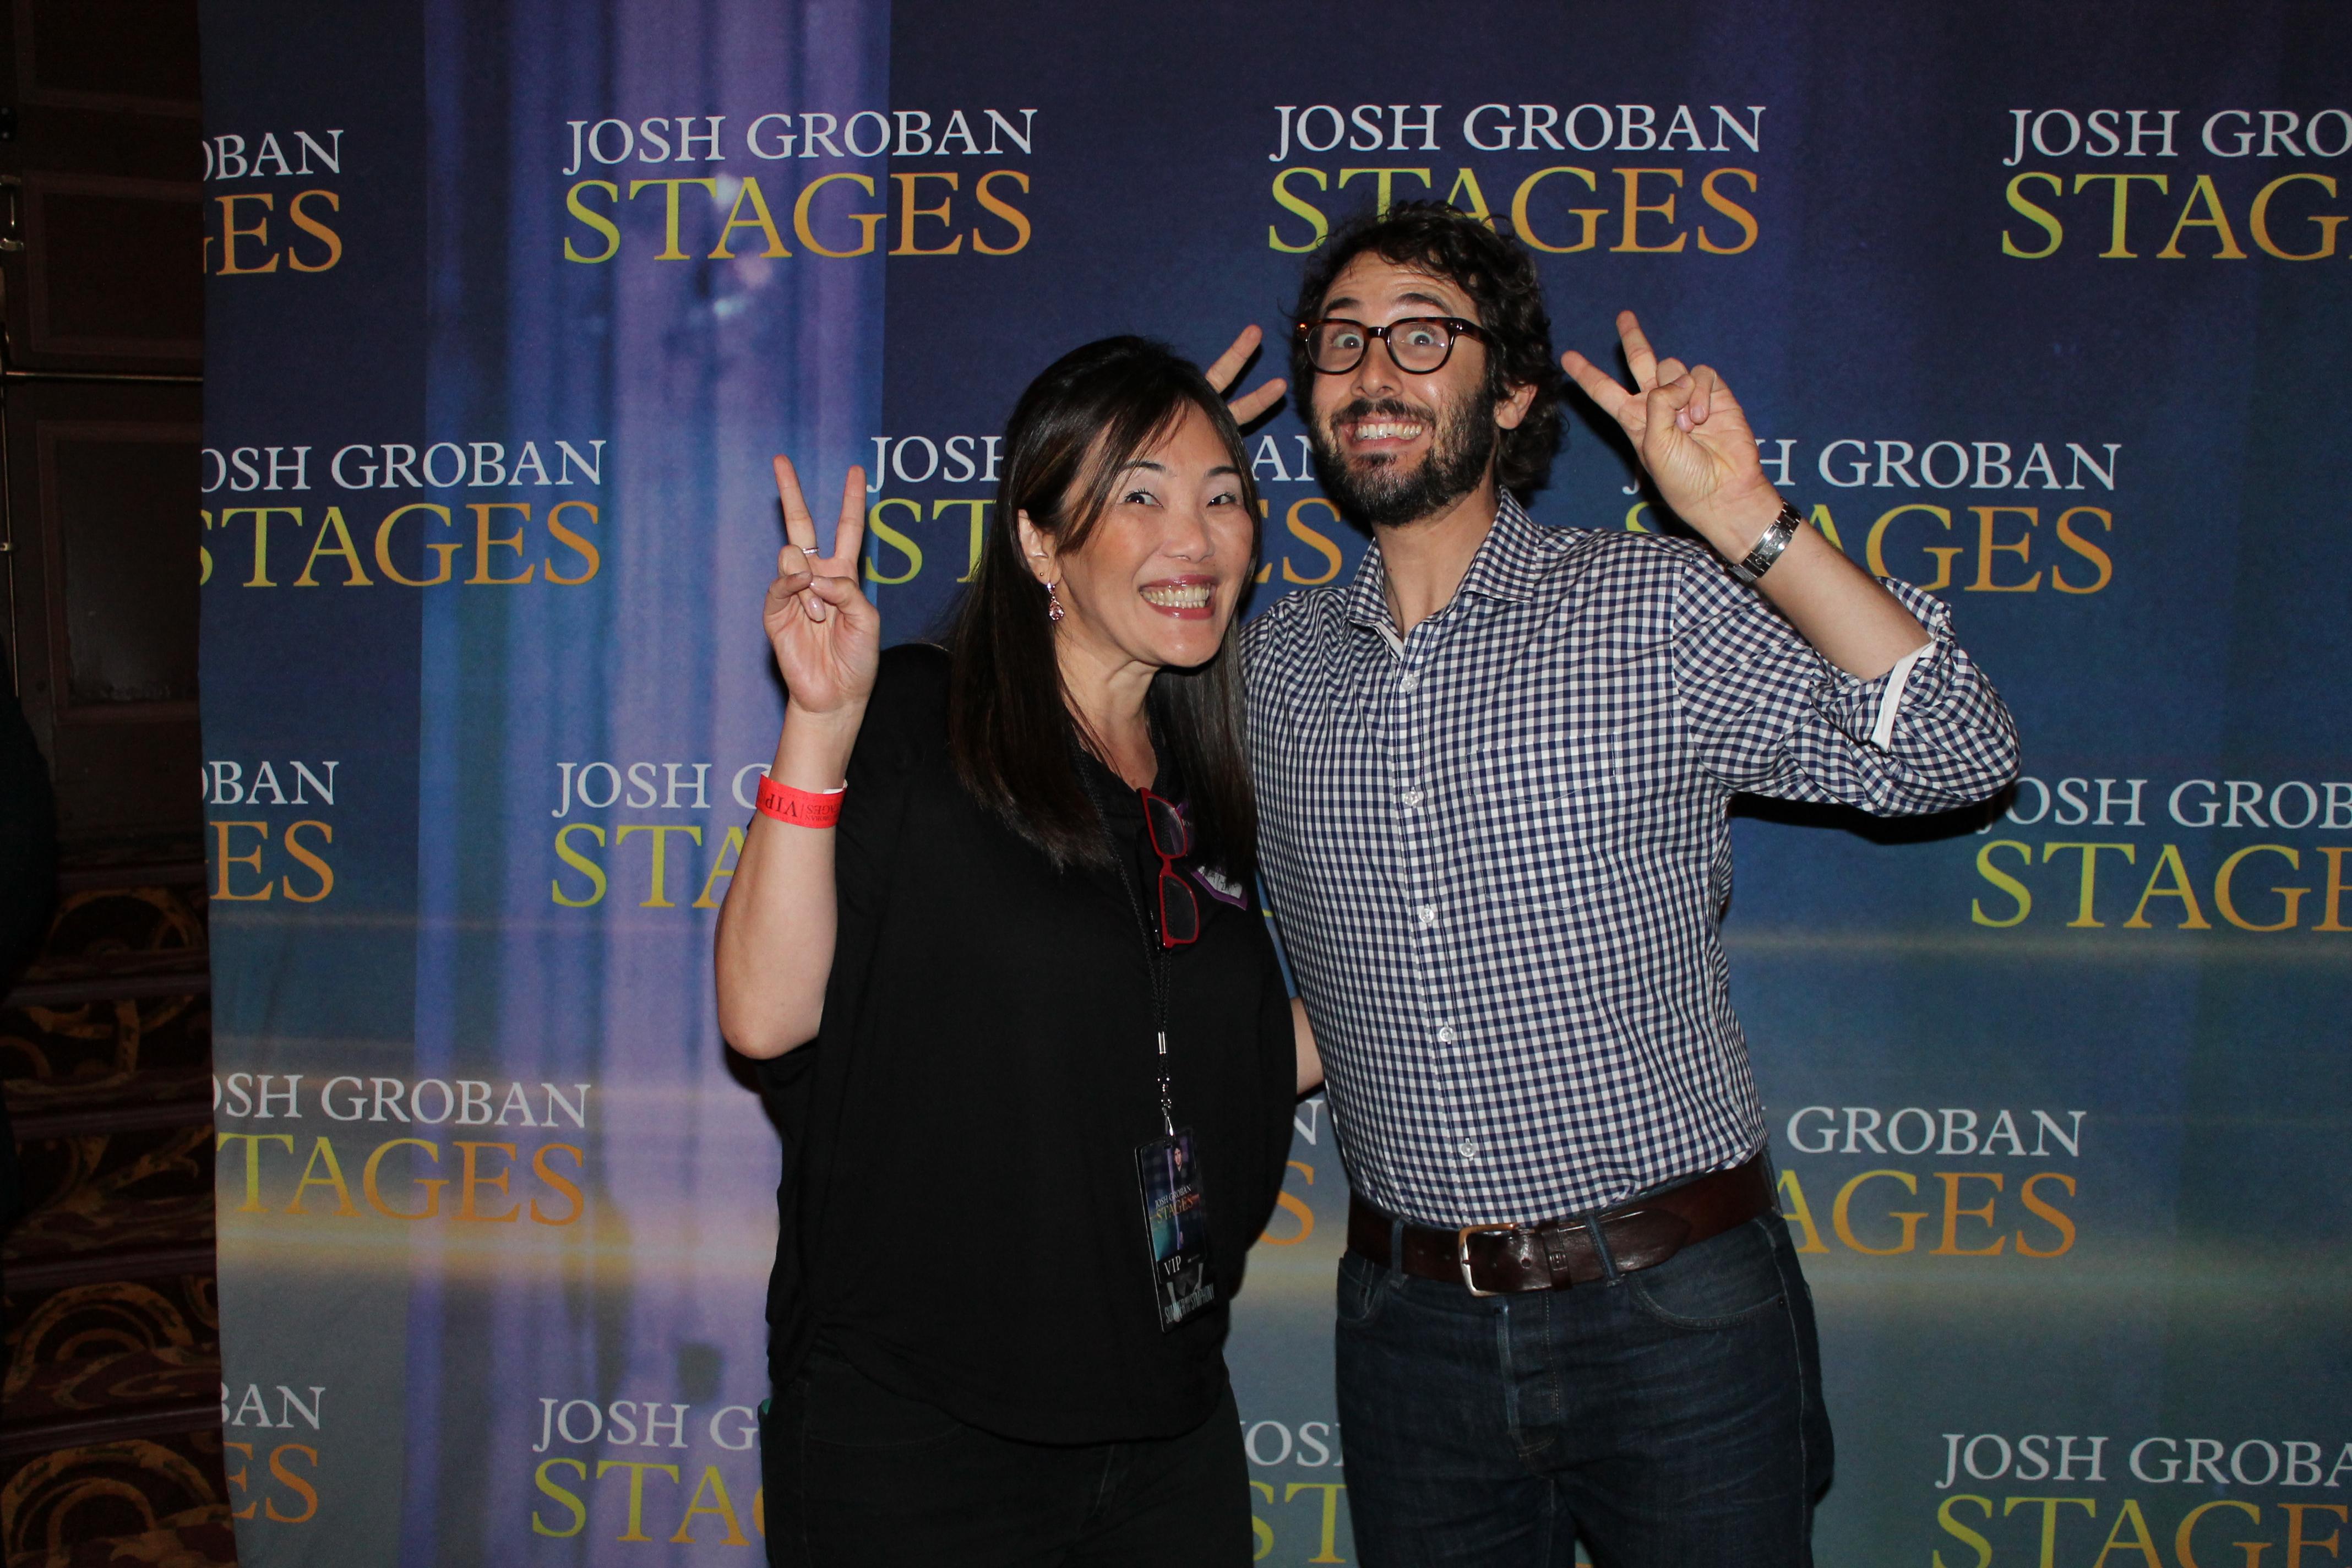 Josh Groban Tour Official Vip Packages Cid Entertainment